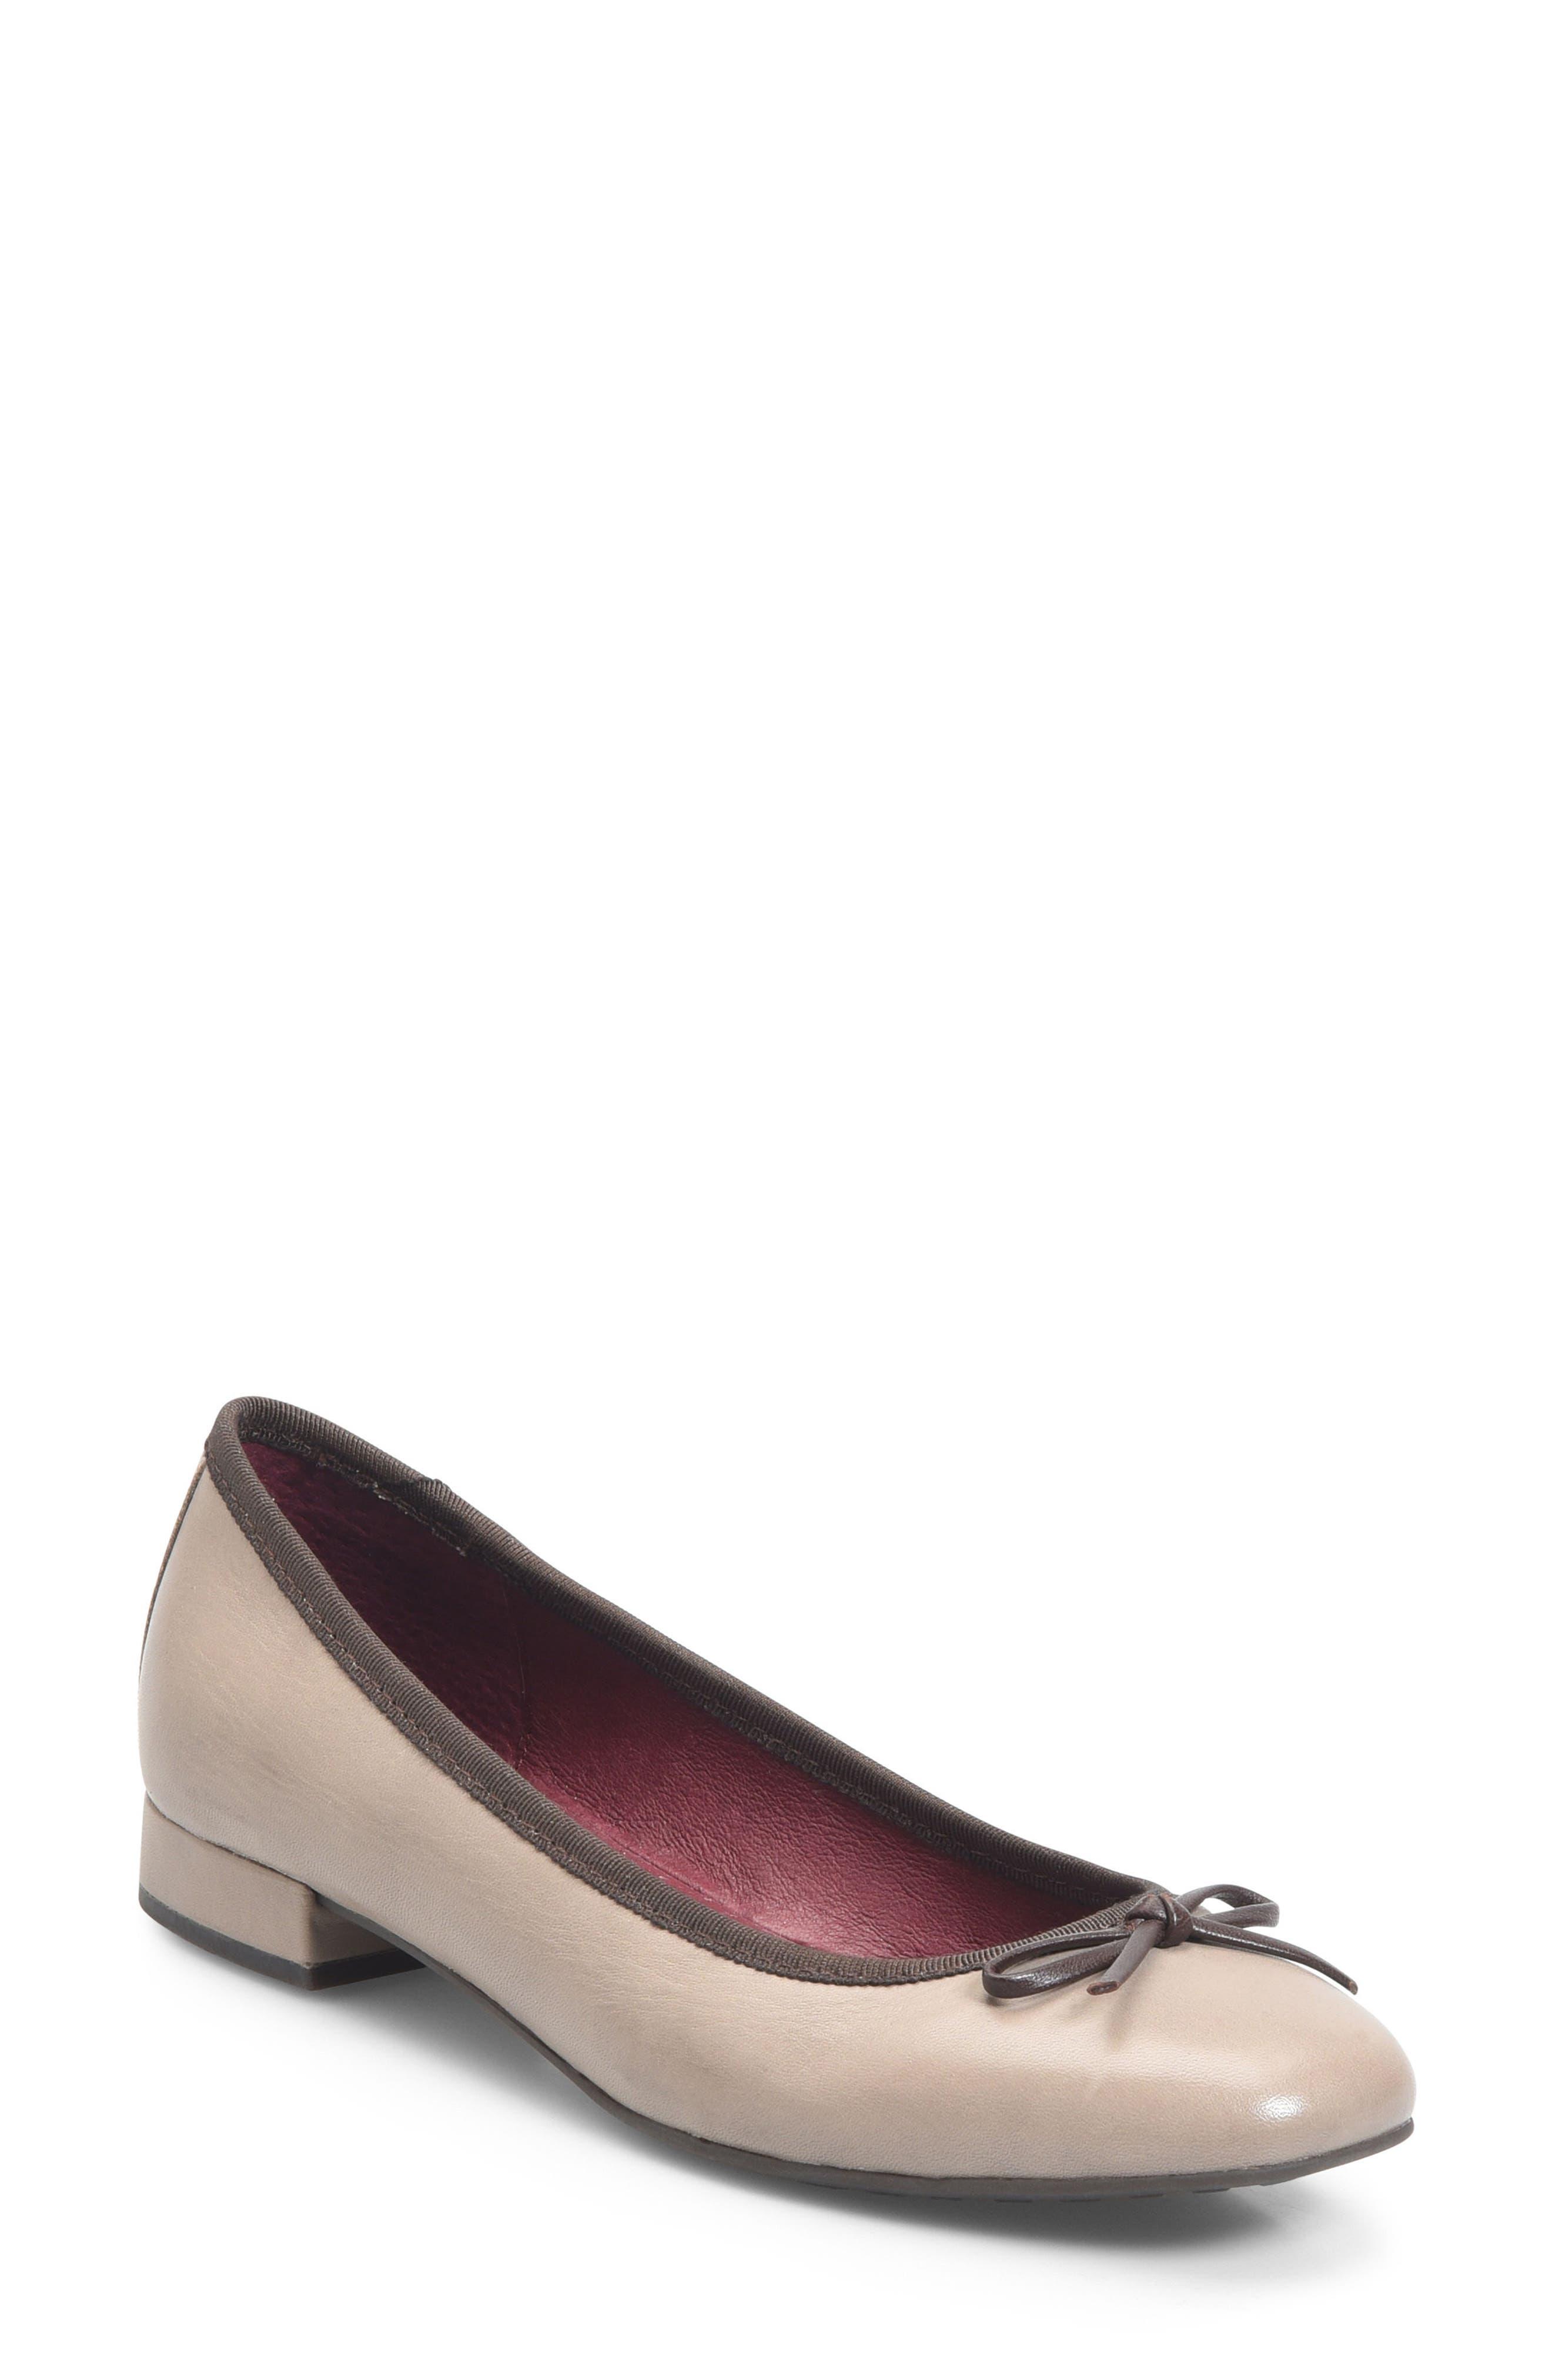 Ono Hallada Ballet Flat, Grey